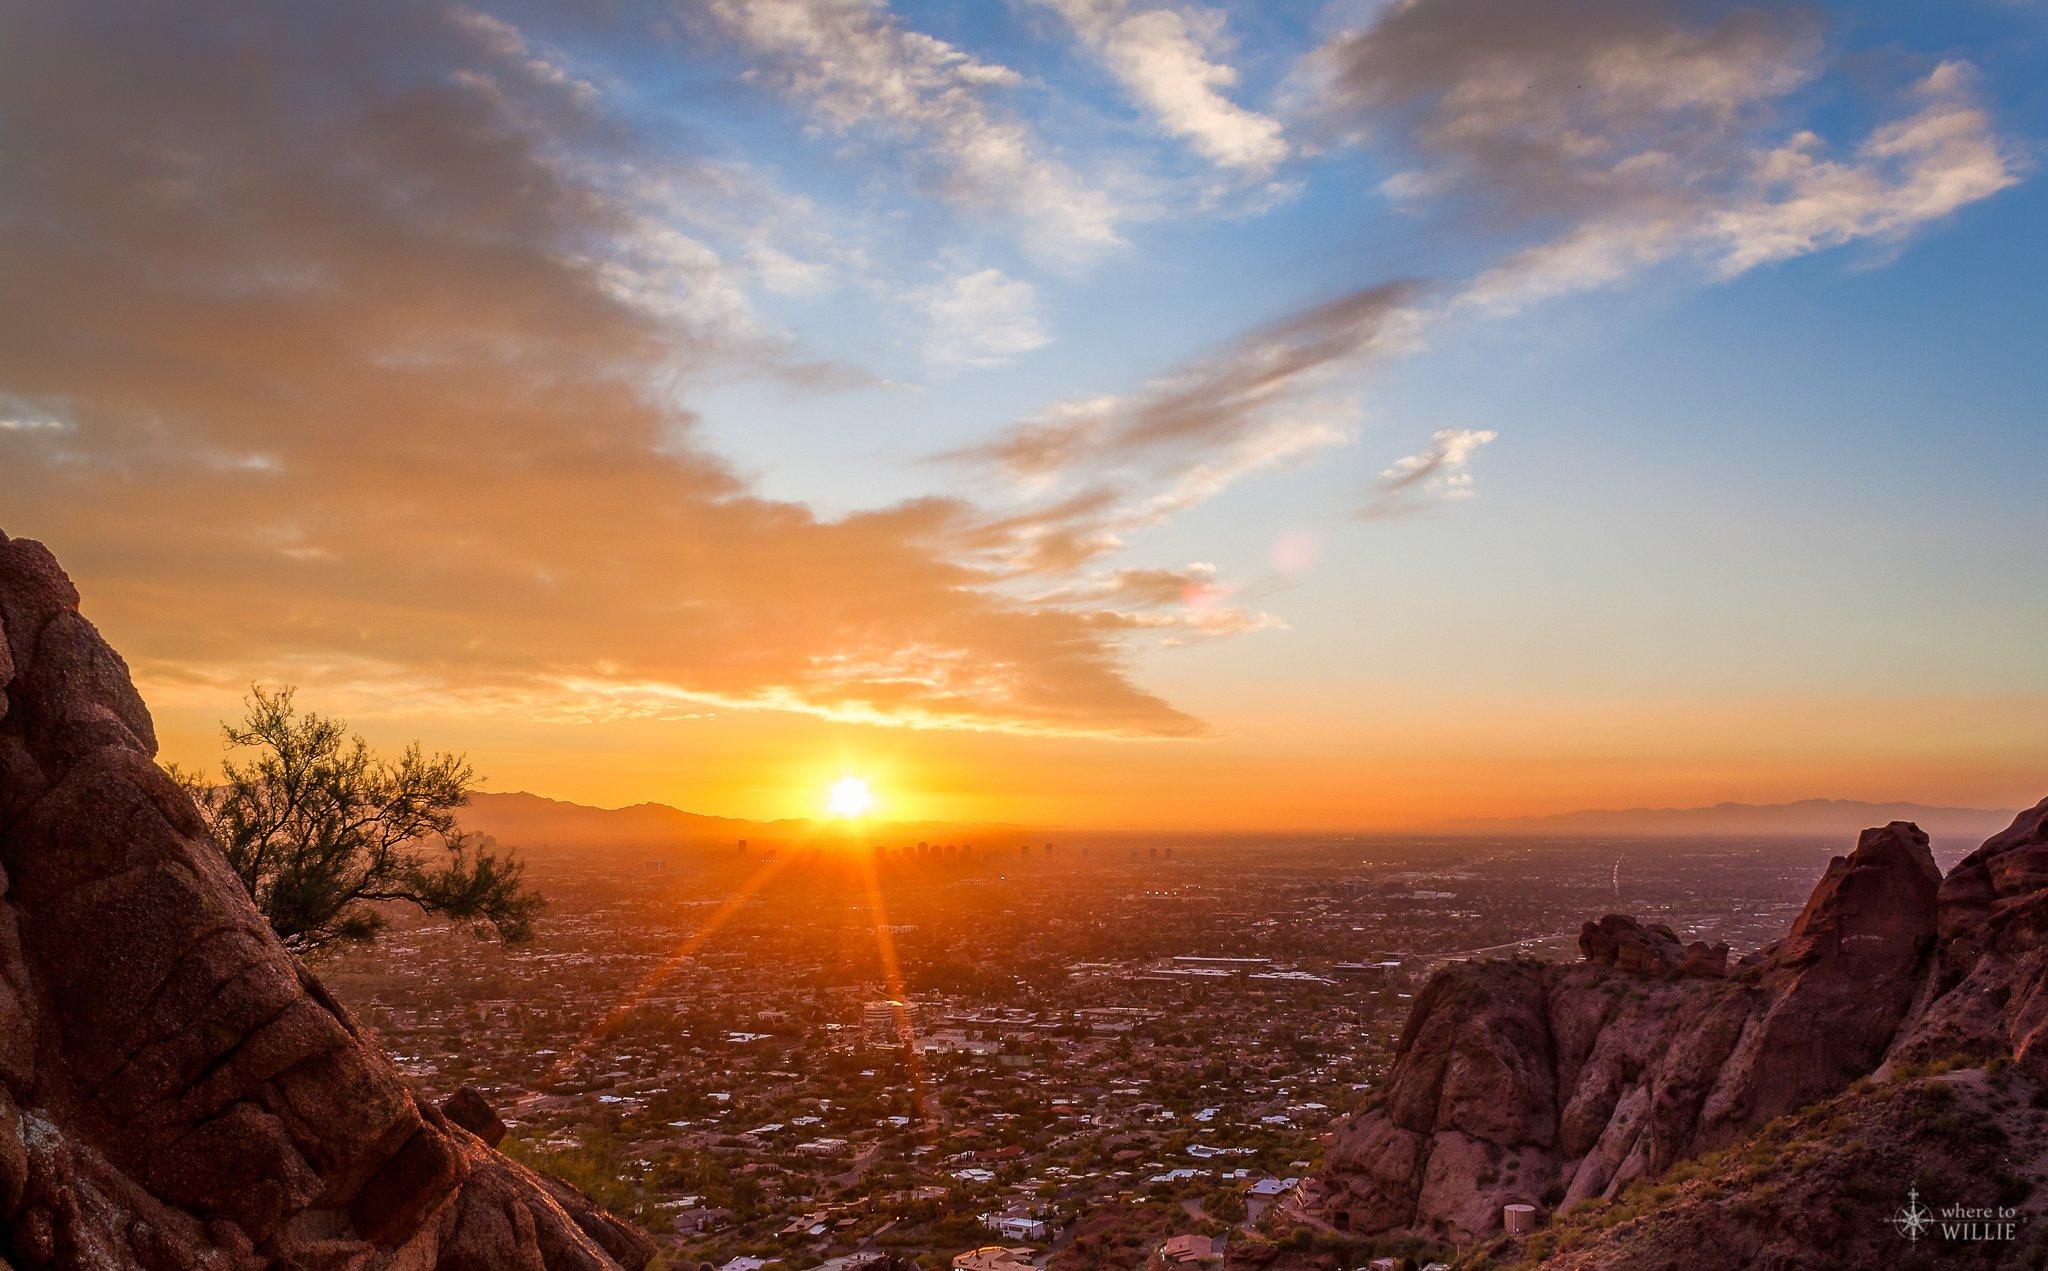 Looking Glass Falls Desktop Wallpaper Sunset Burning Over Phoenix Camelback Mountain